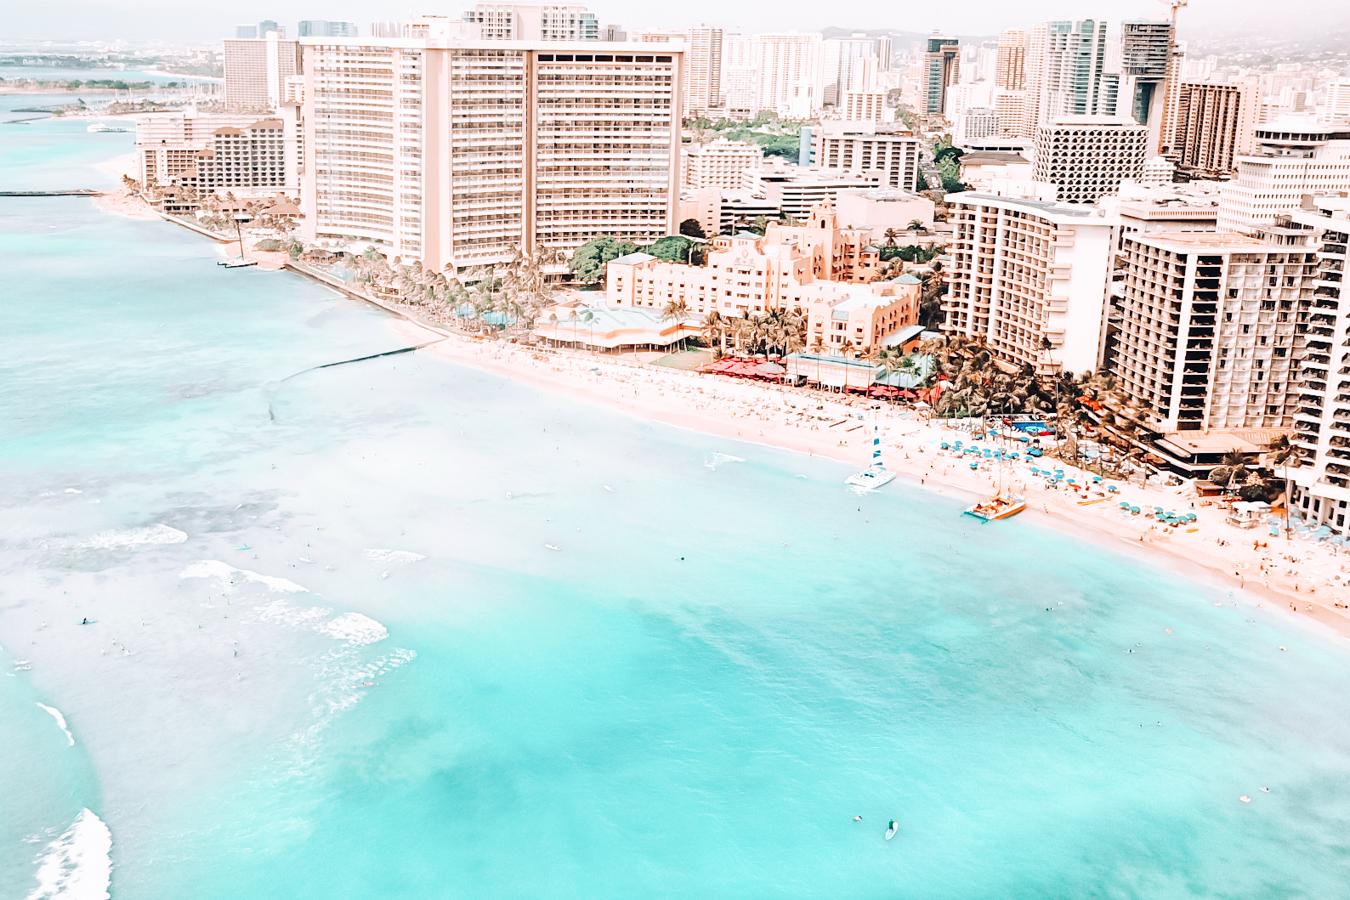 View of water and buildings in Honolulu